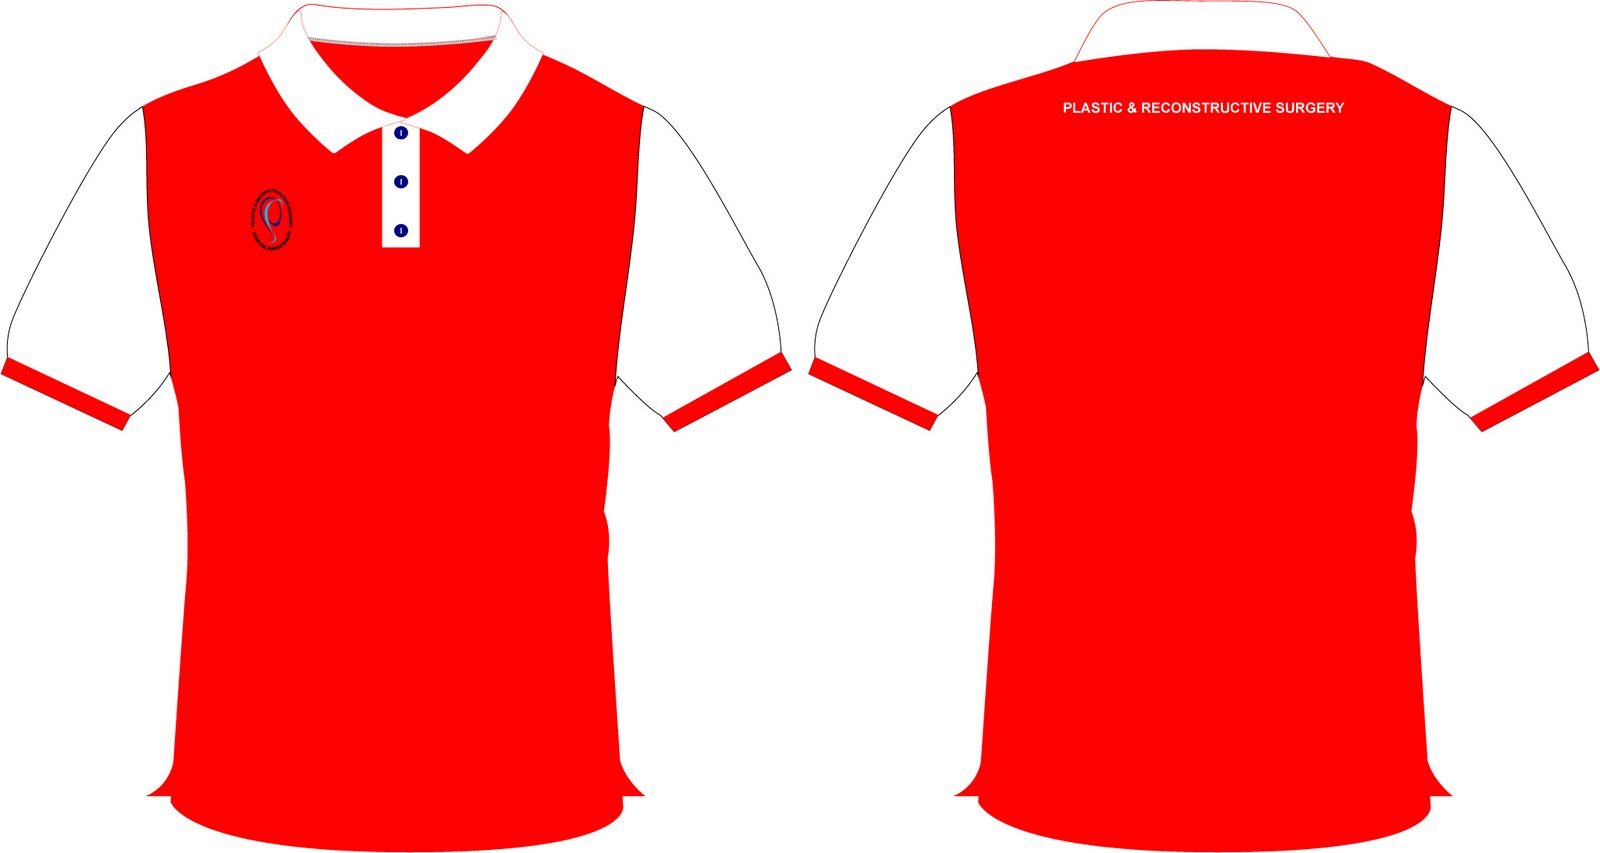 Shirt design red - Shirt Design Red 30